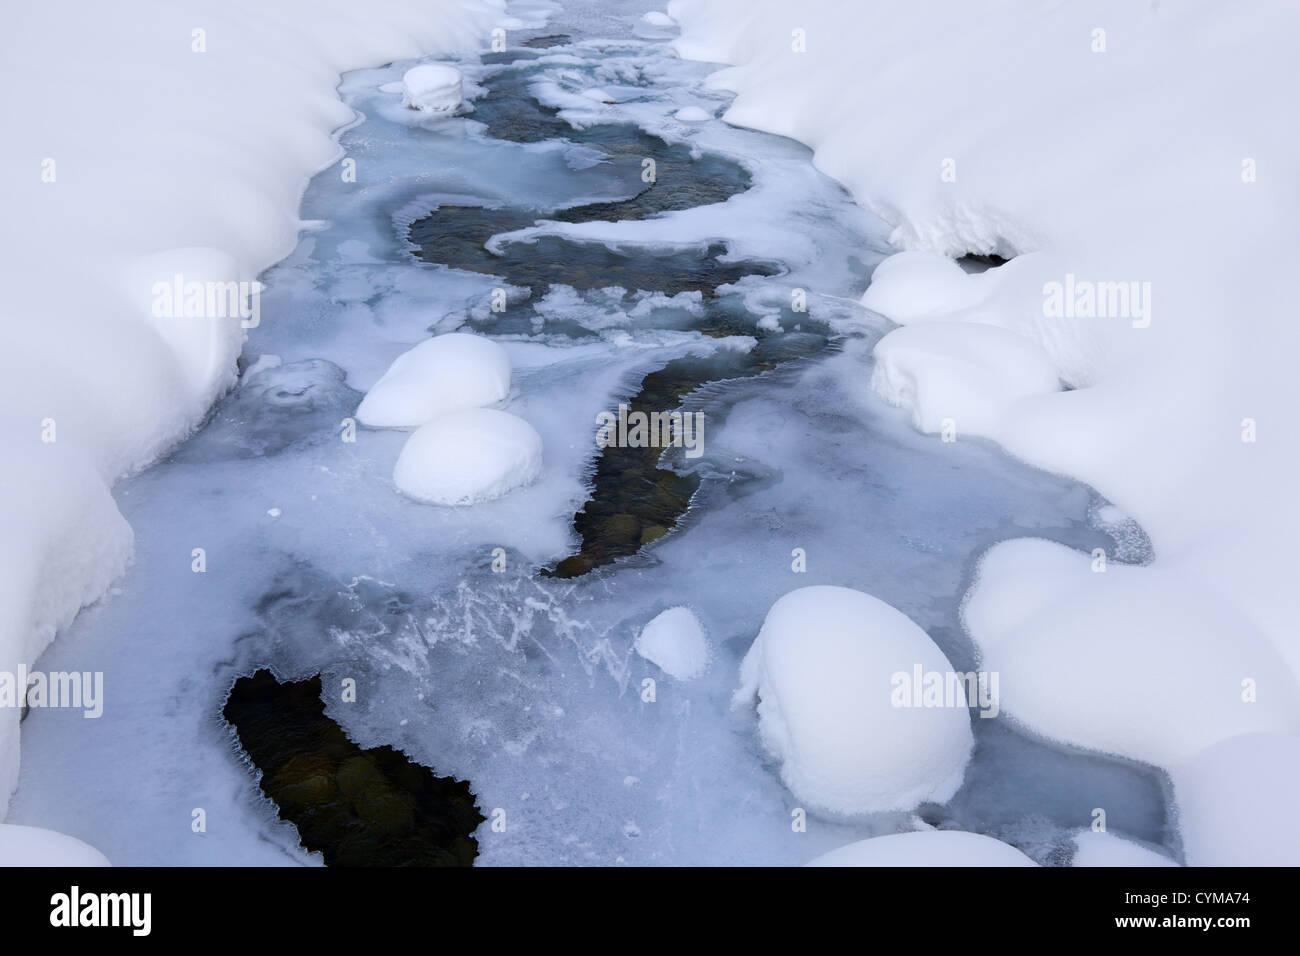 La Navisence, a snowy glacial river partly frozen - Stock Image